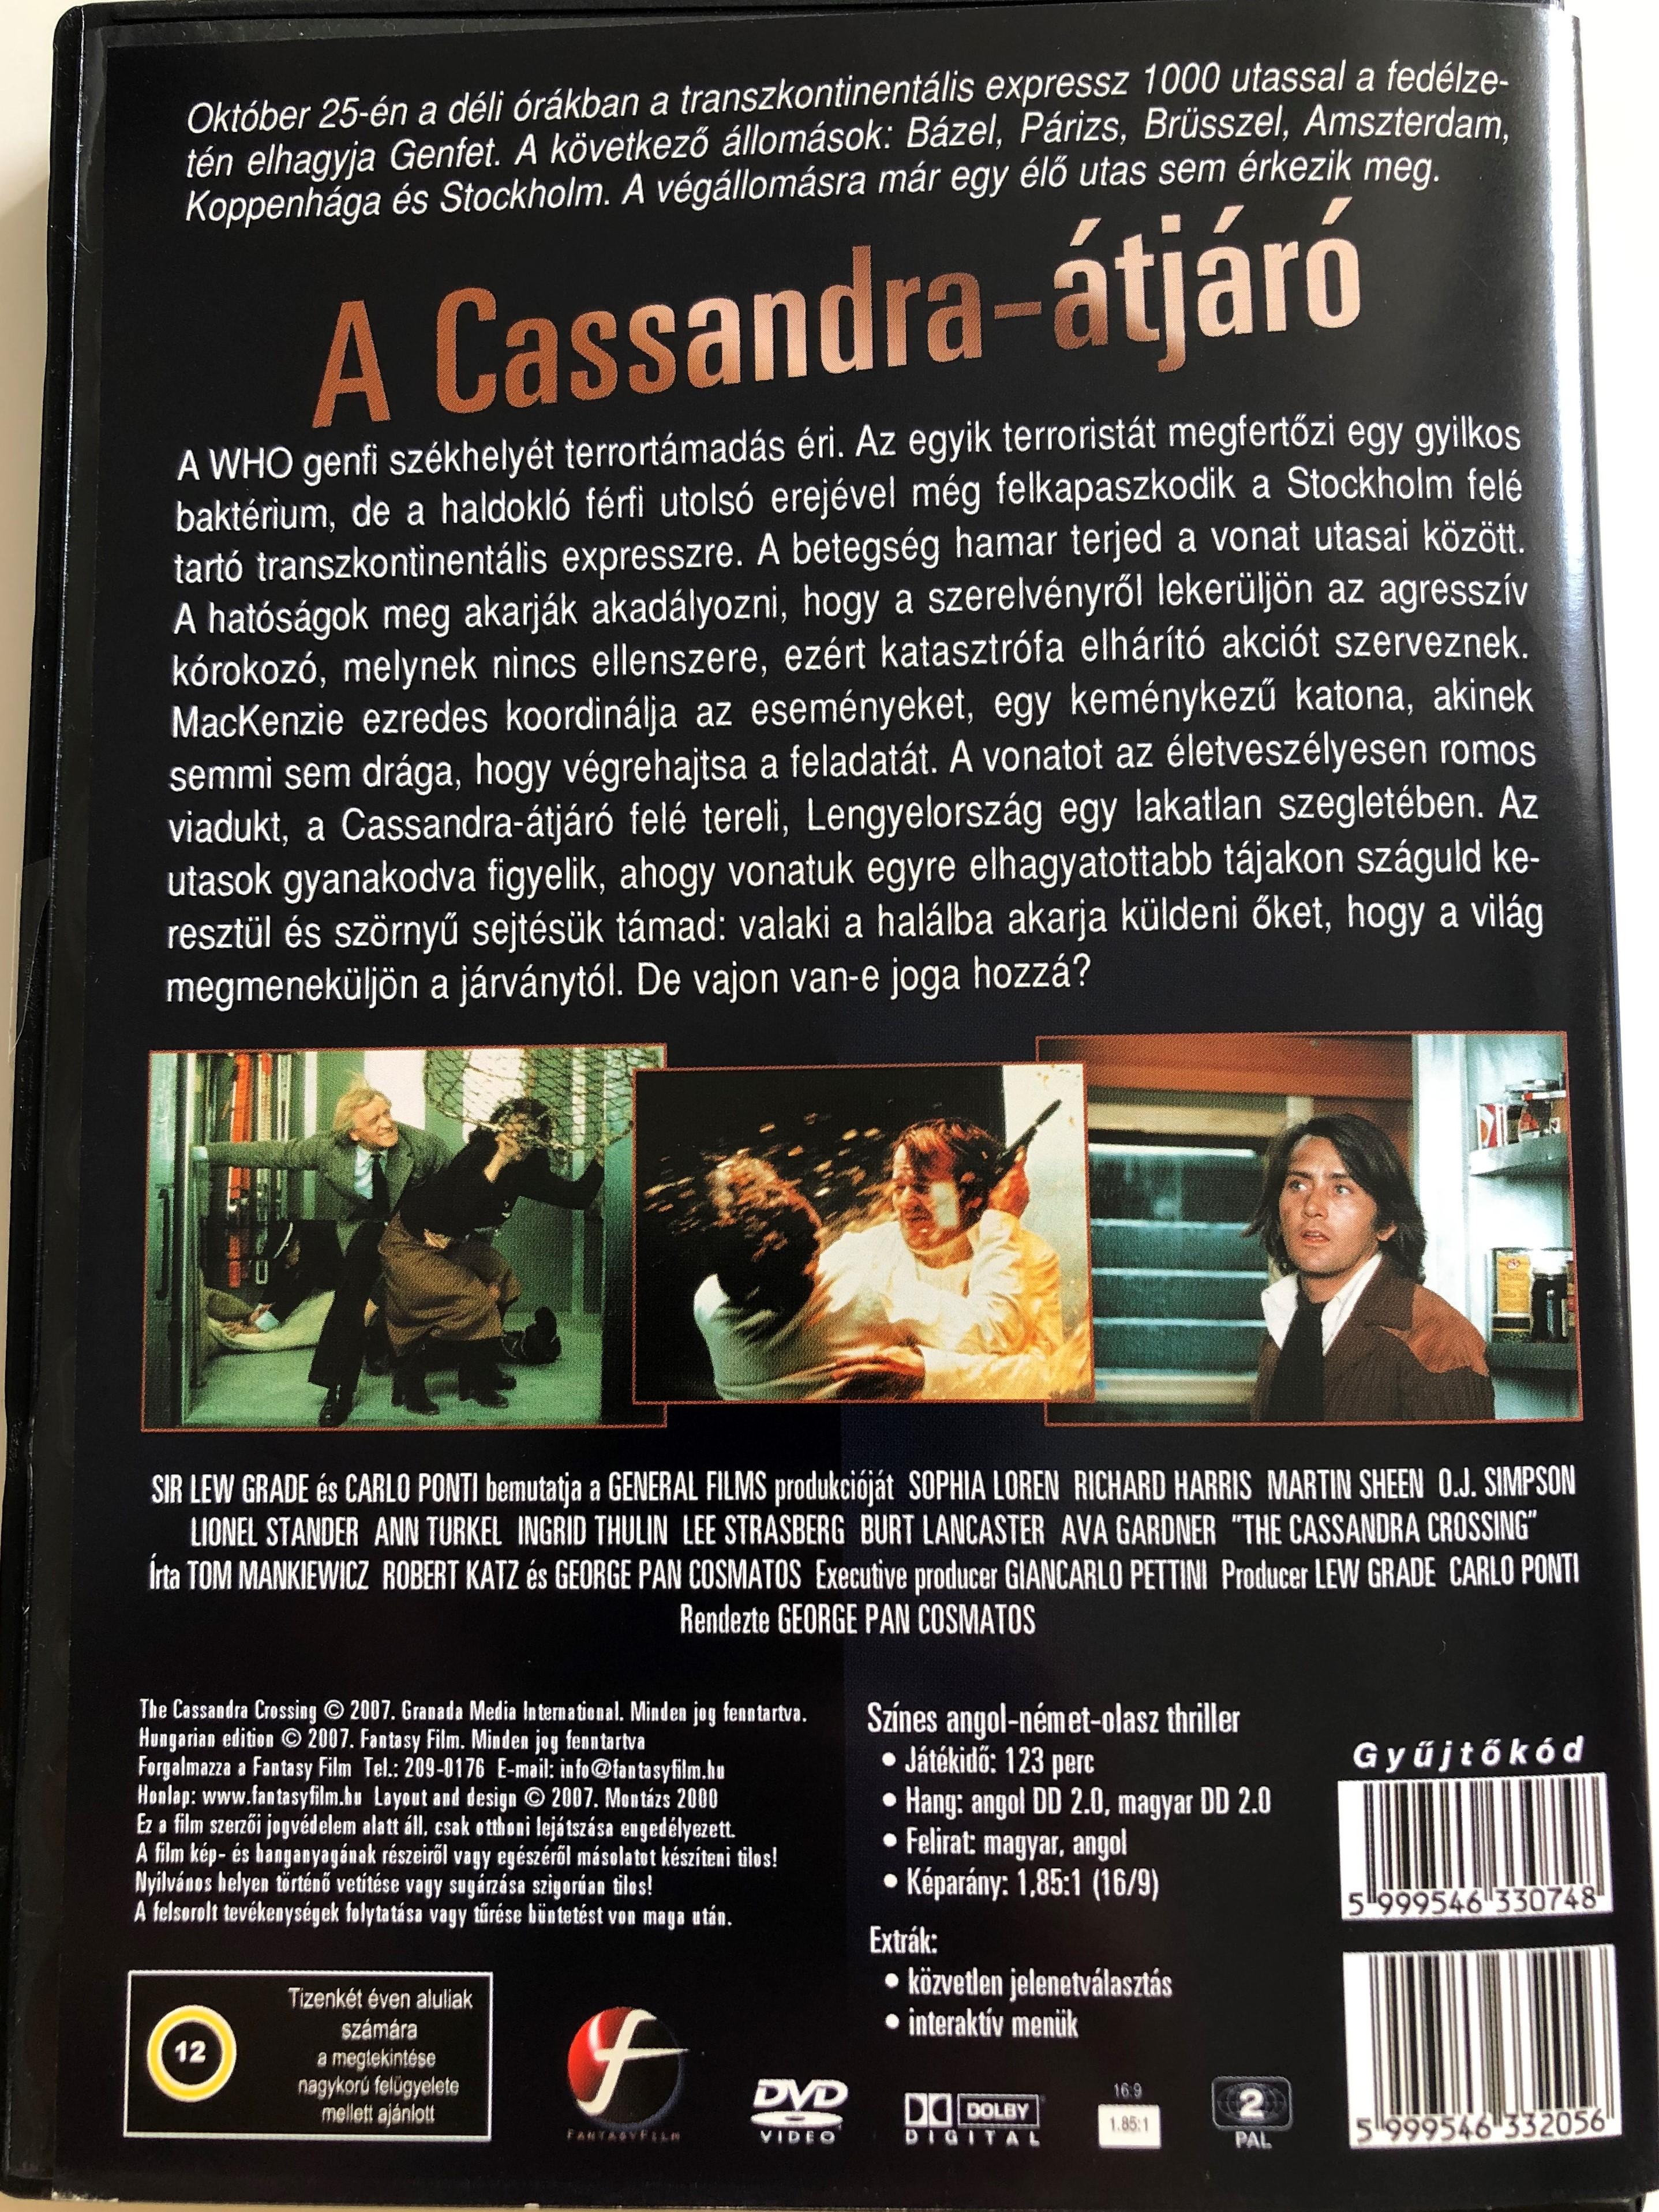 the-cassandra-crossing-dvd-1976-a-cassandra-tj-r-directed-by-george-pan-cosmatos-starring-sophia-loren-richard-harris-martin-sheen-o.j-simpson-lionel-stander-ann-turkel-burt-lancaster-ava-gardner-2-.jpg